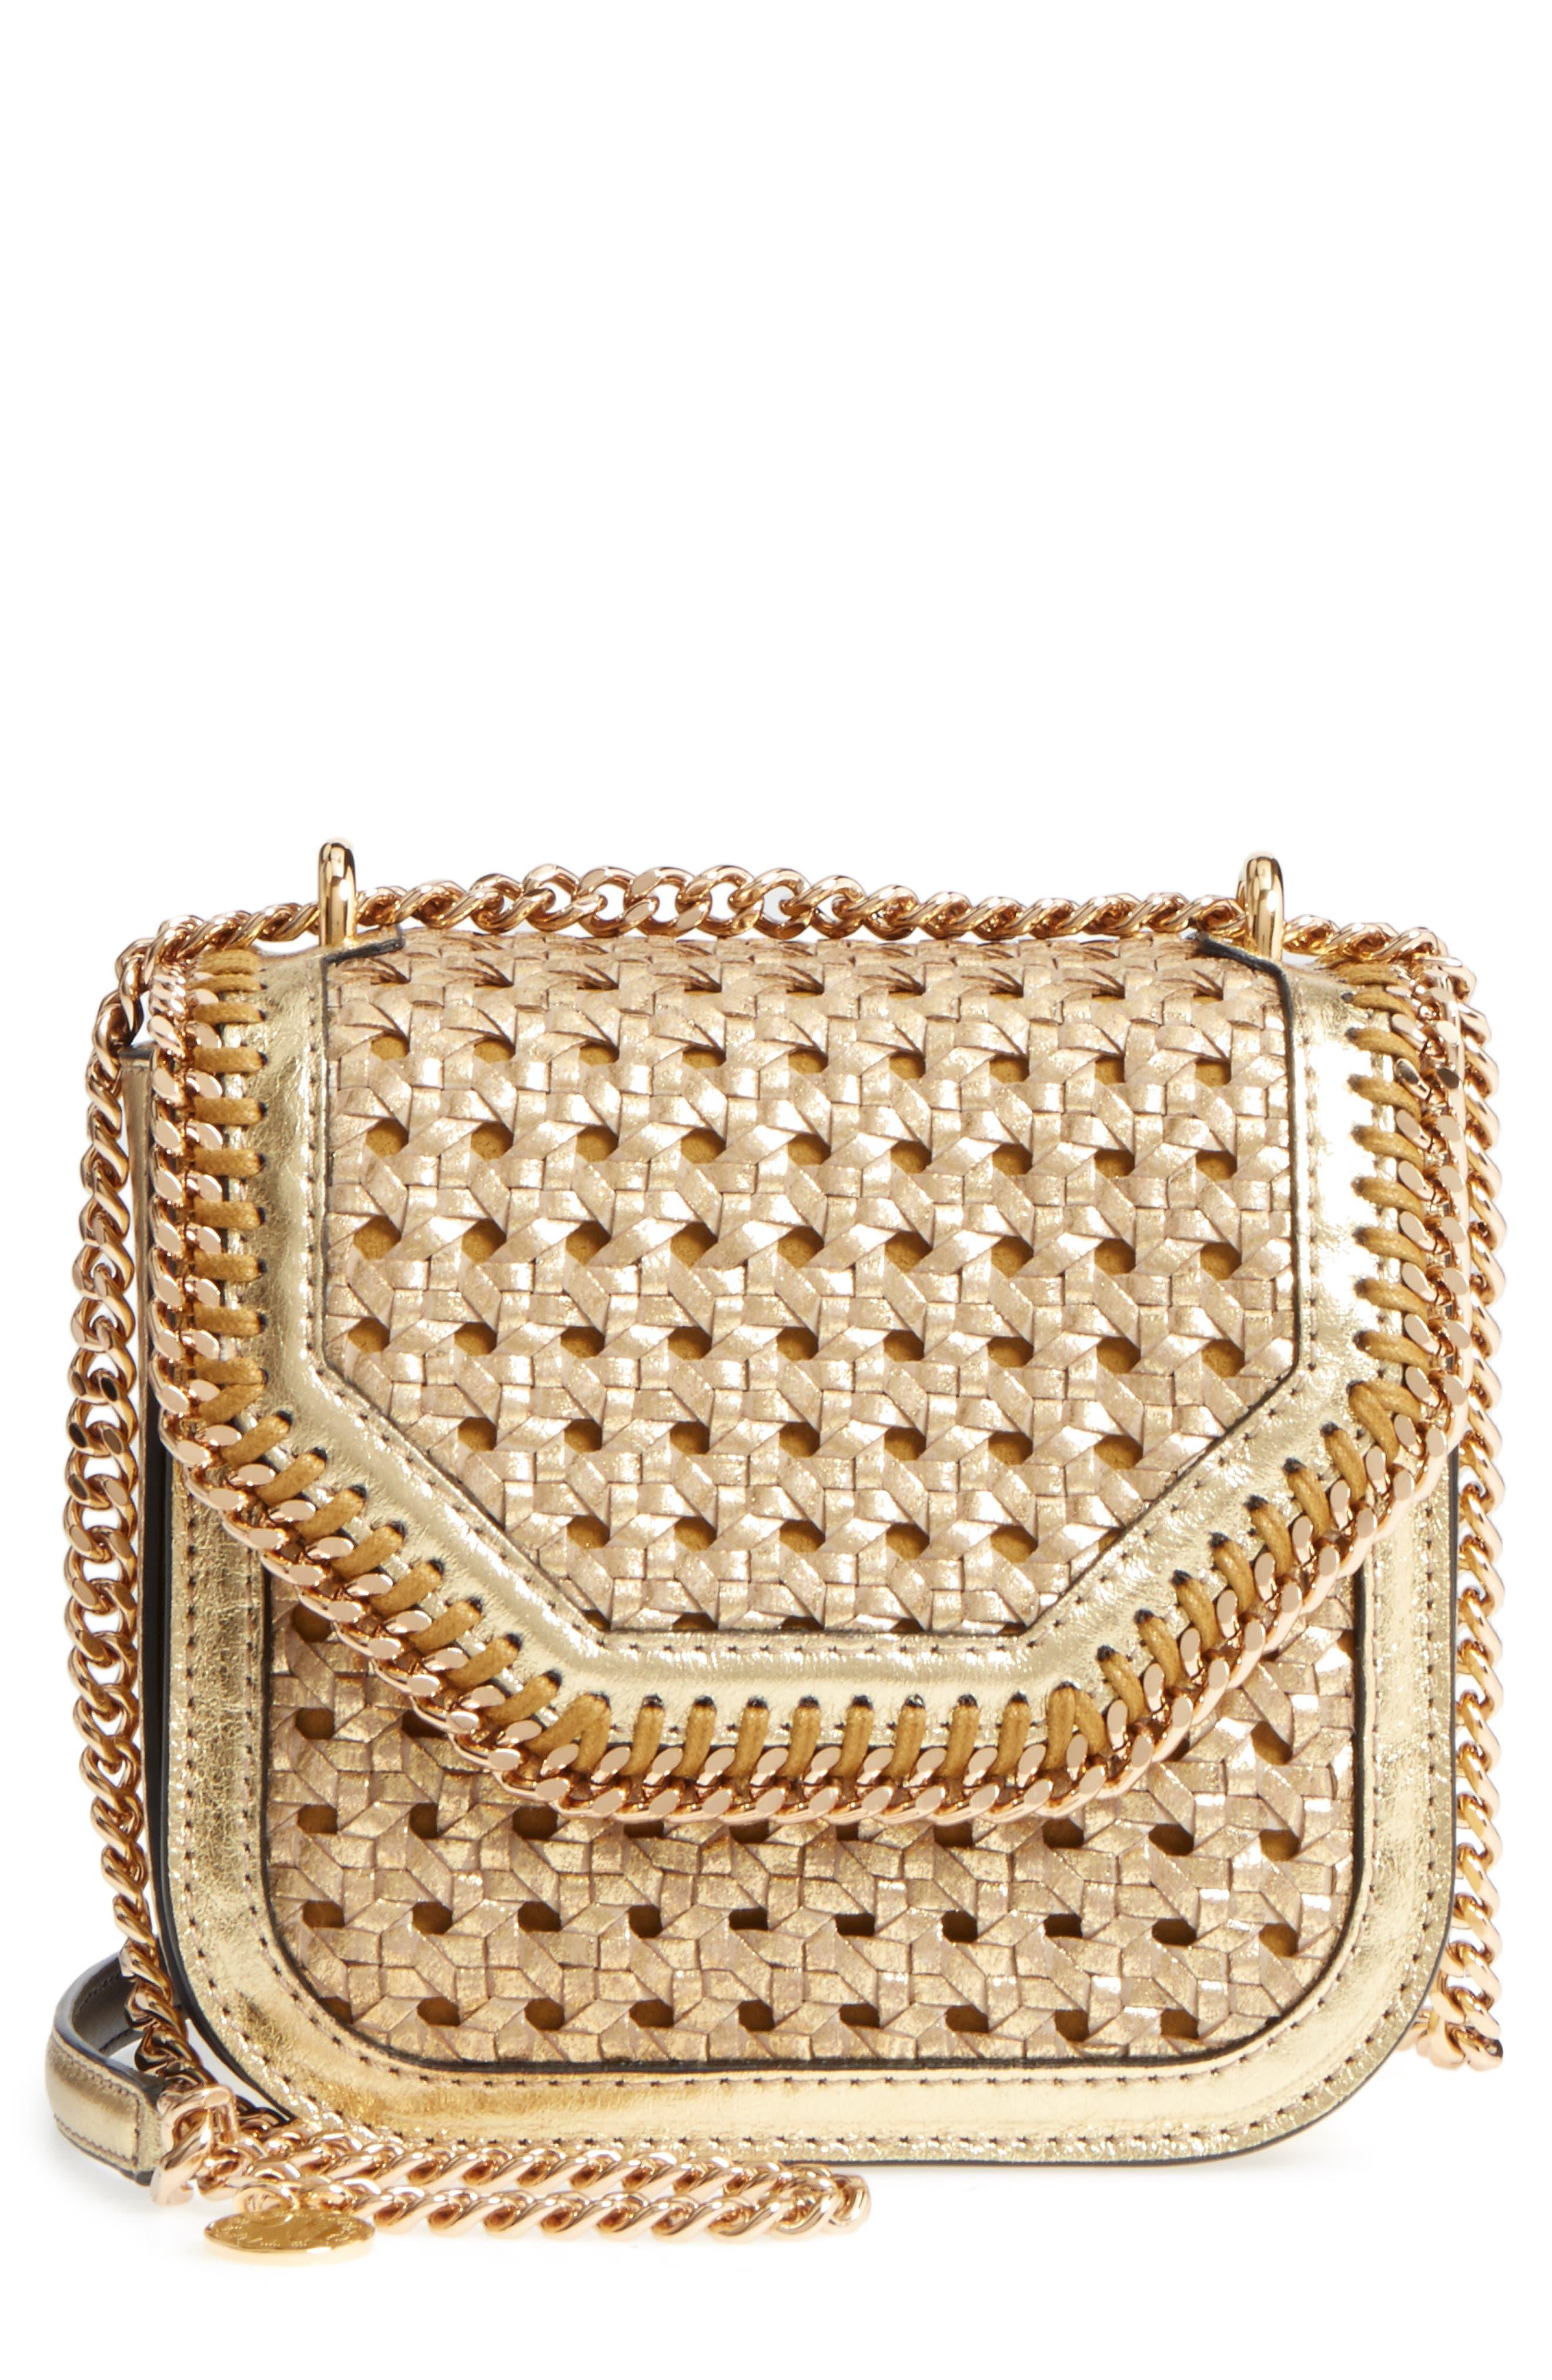 Alternate Image 1 Selected - Stella McCartney Falabella Box Woven Metallic Faux Leather Shoulder Bag